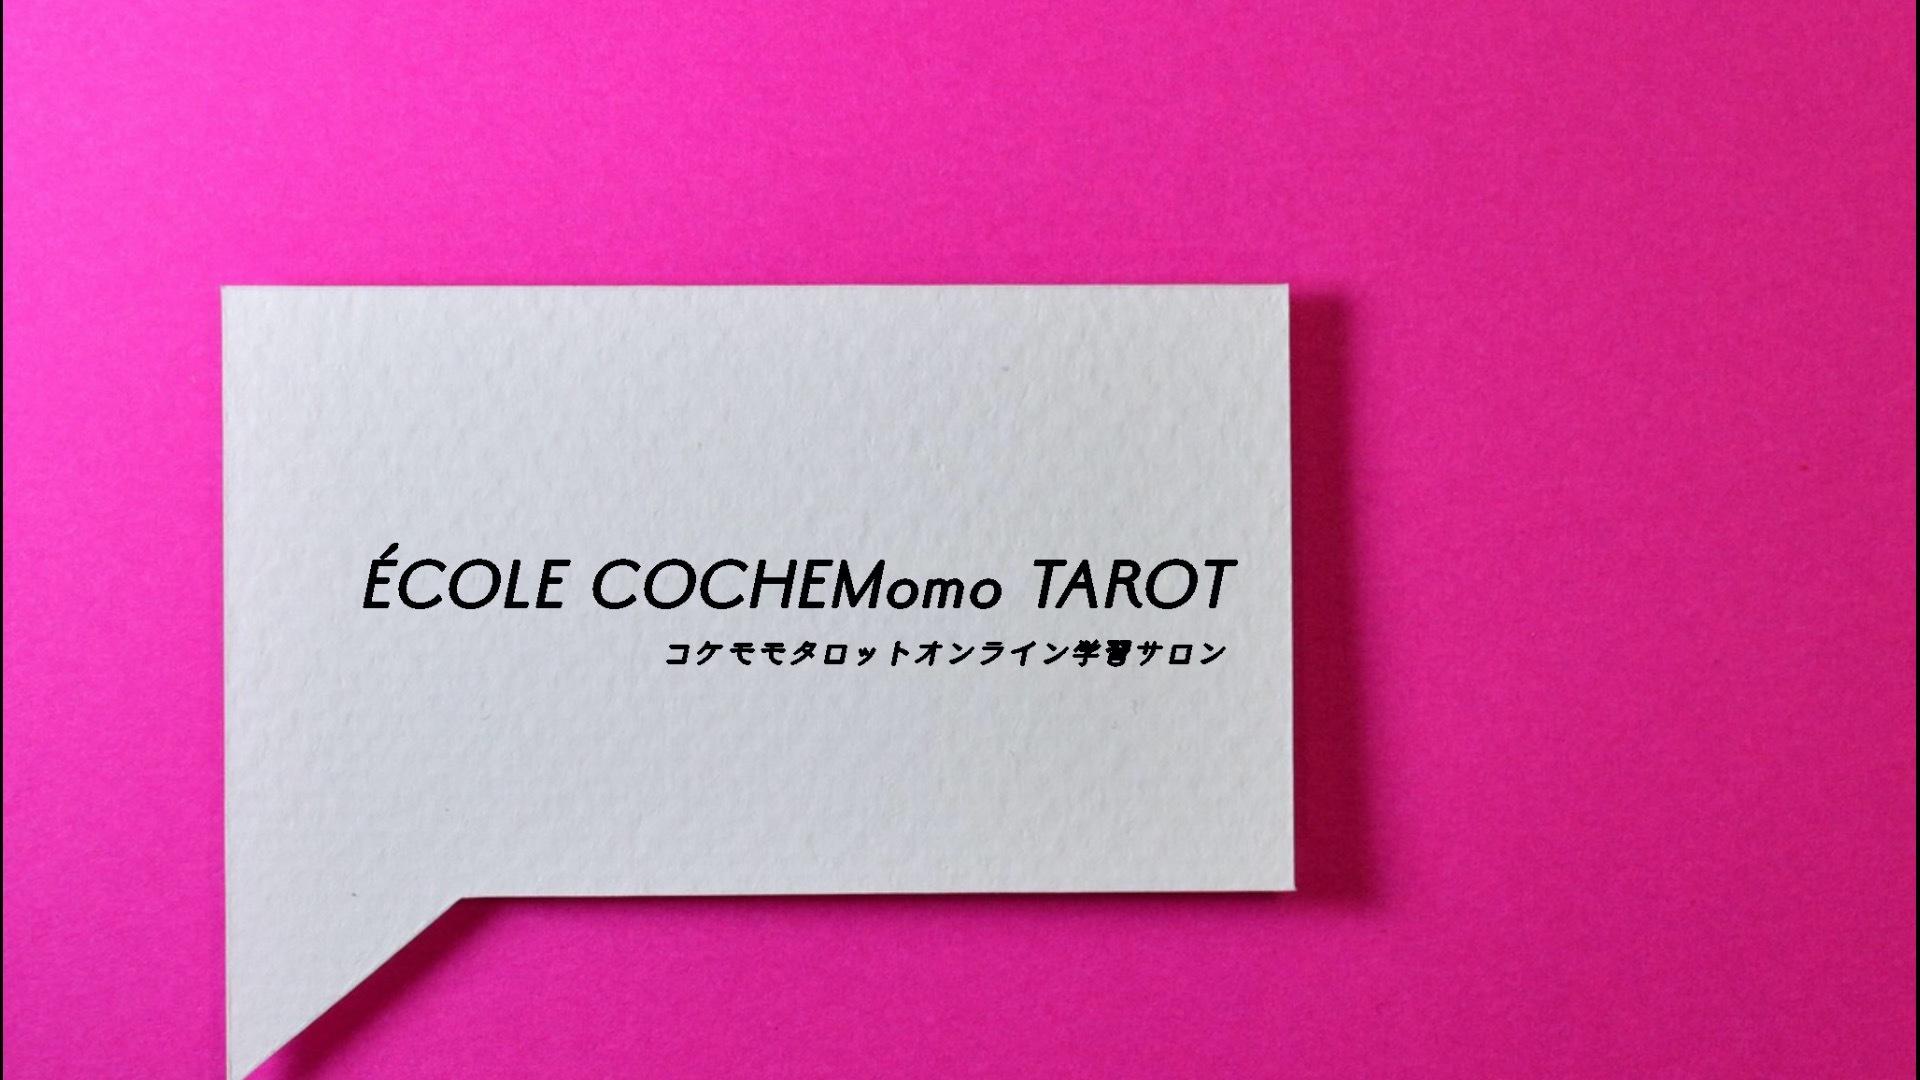 ÉCOLE COCHEMomo Tarot